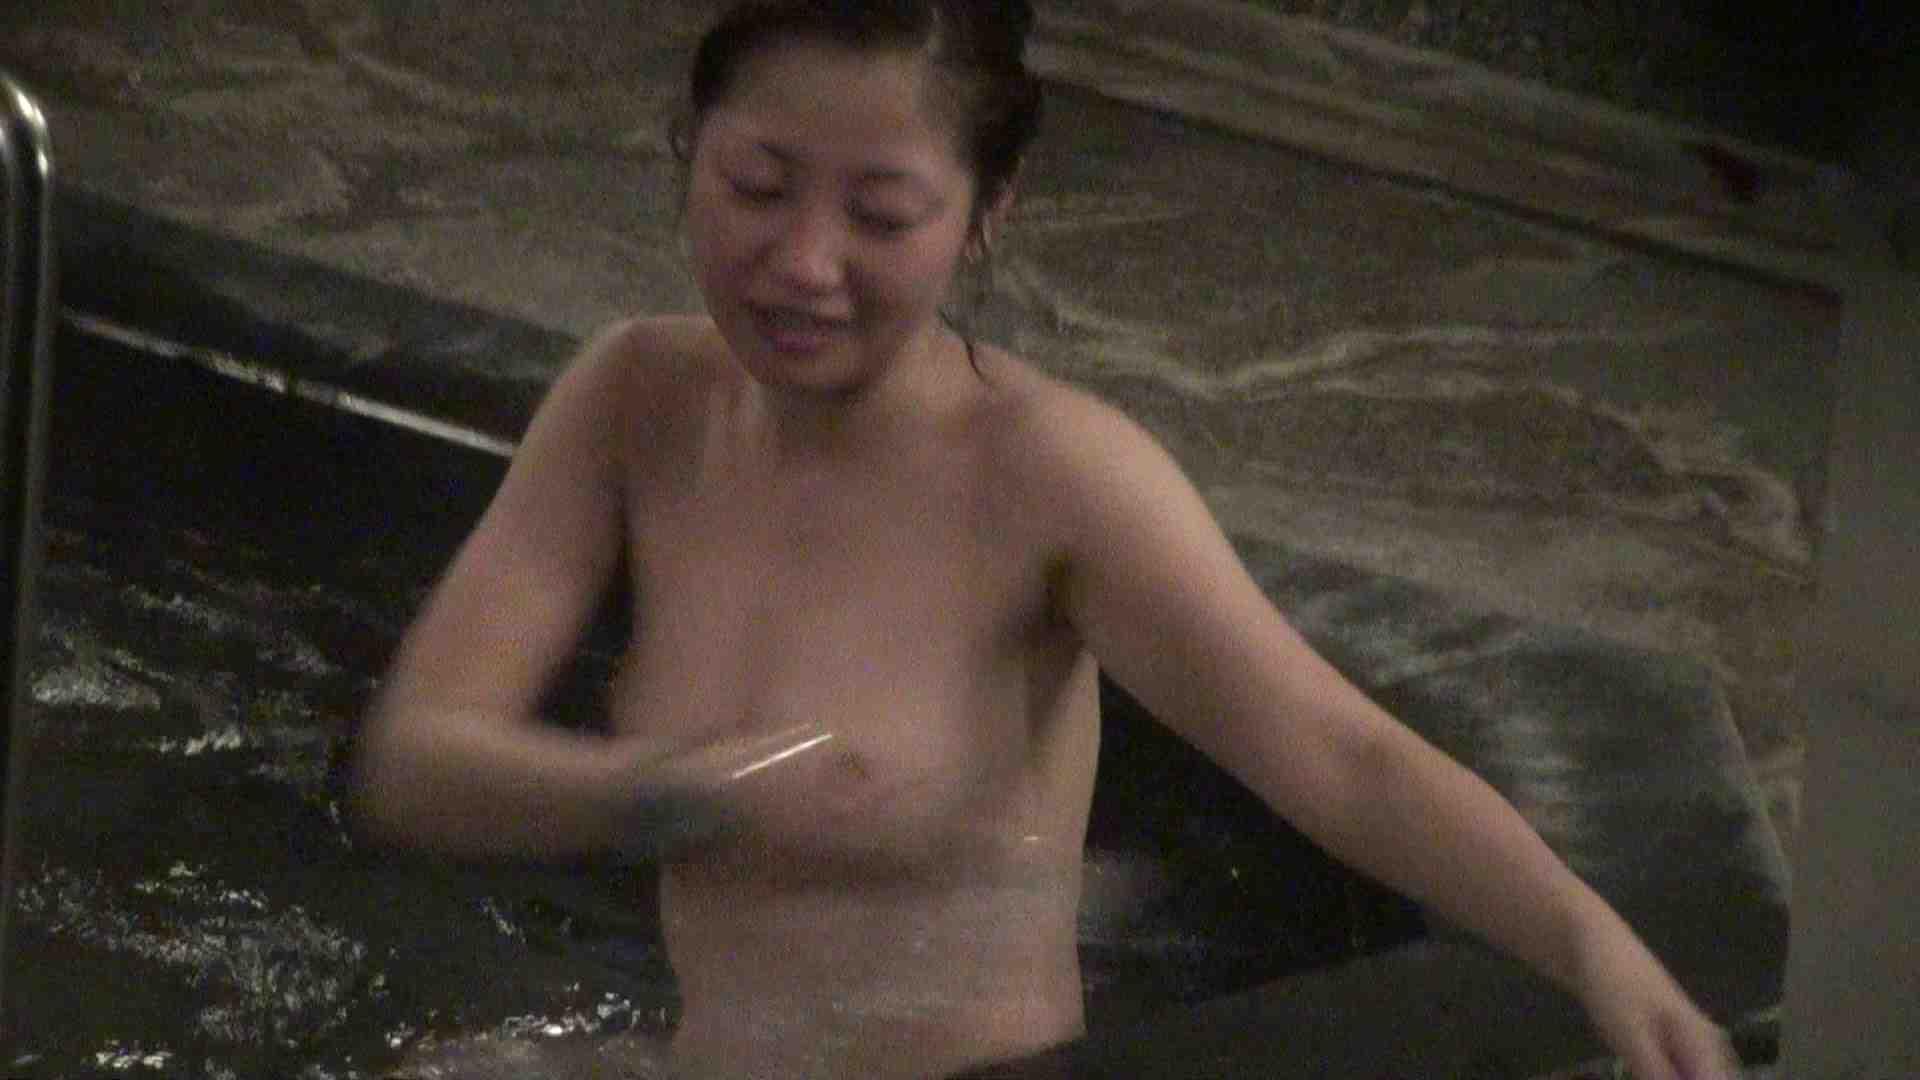 Aquaな露天風呂Vol.422 盗撮映像  61Pix 49